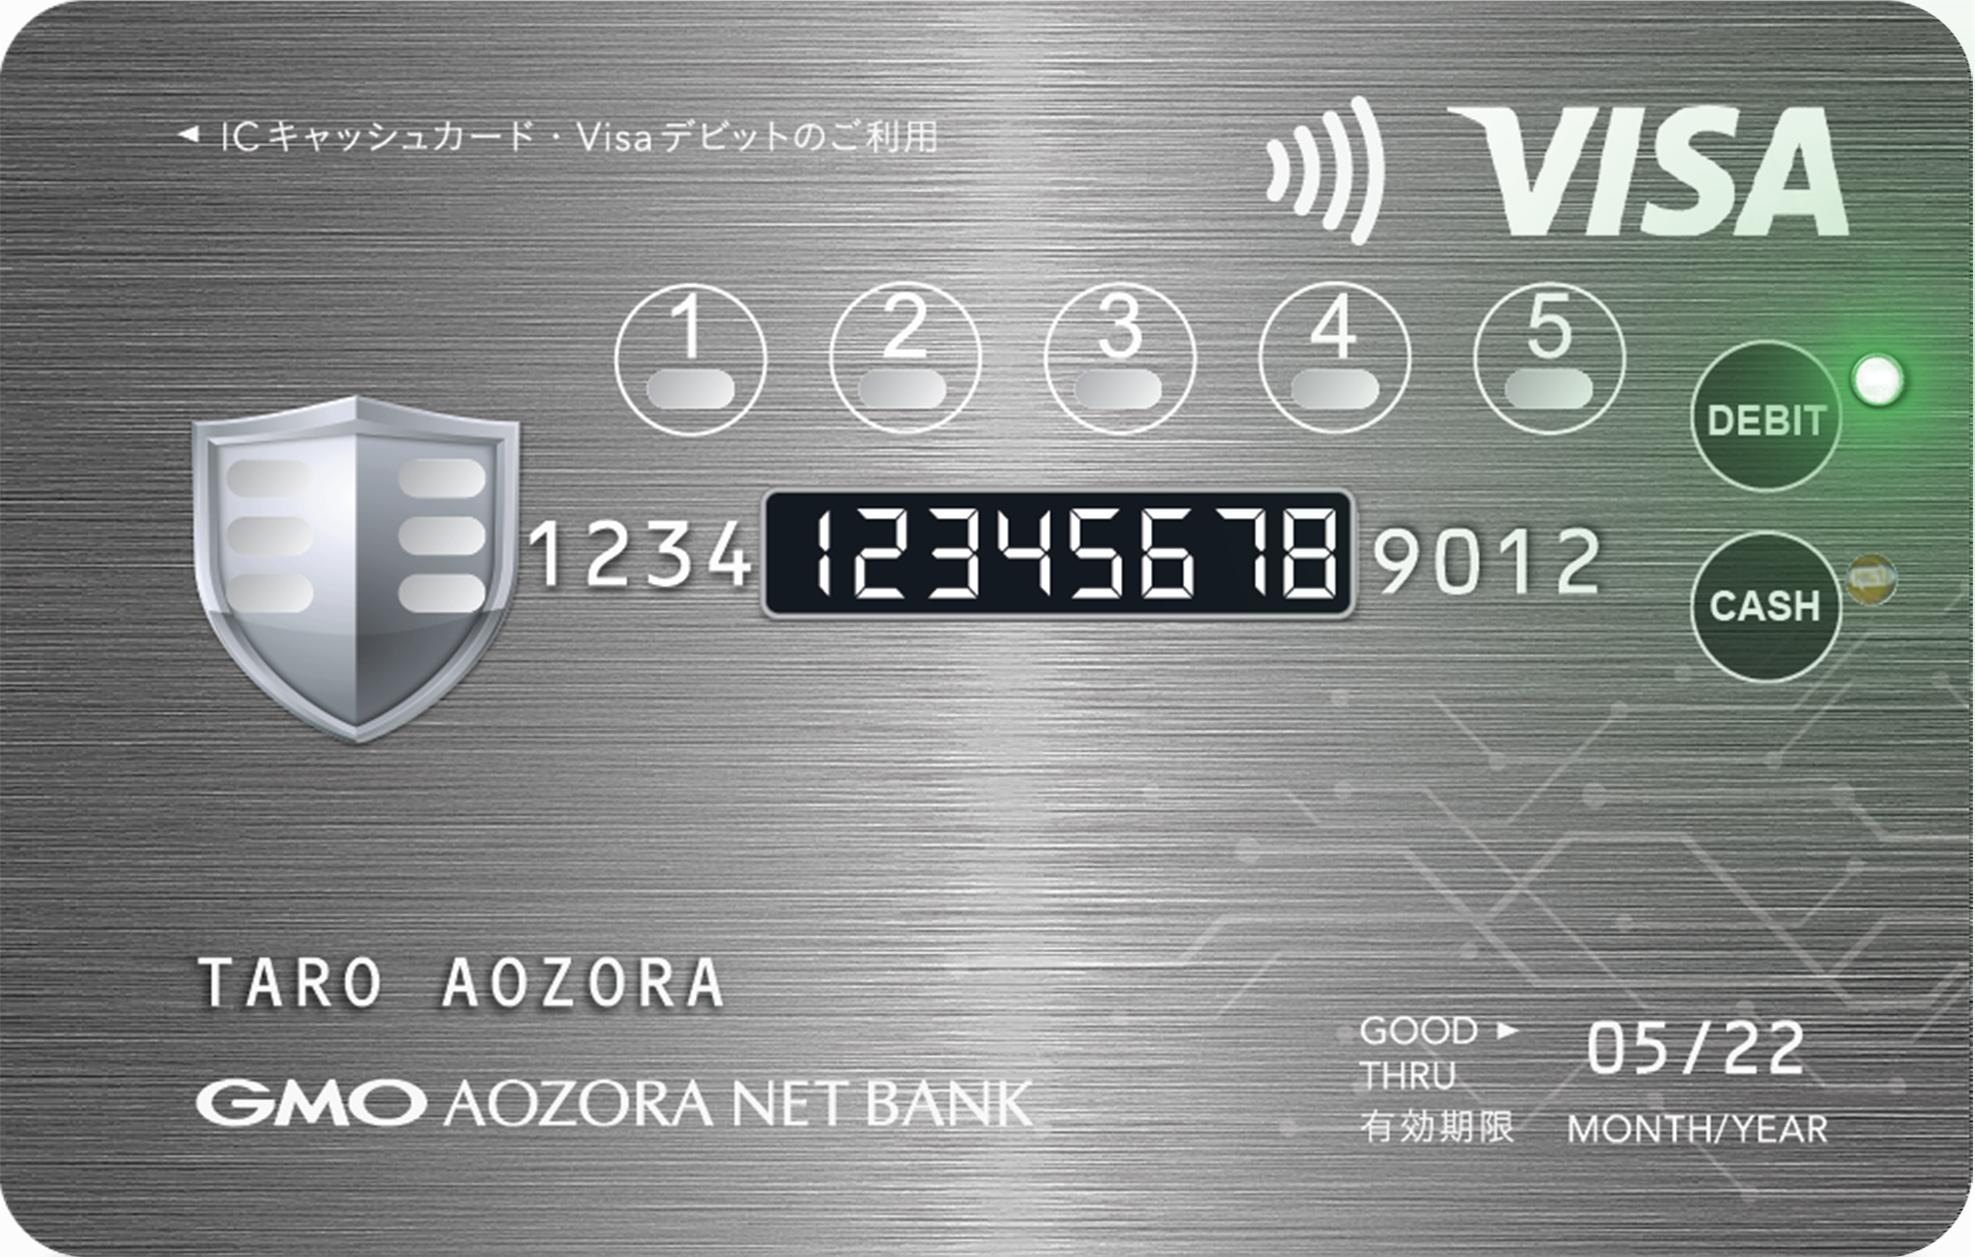 GMO Aozora Net Bank, Ltd. and Dynamics Inc. Introduce Japan\'s First ...